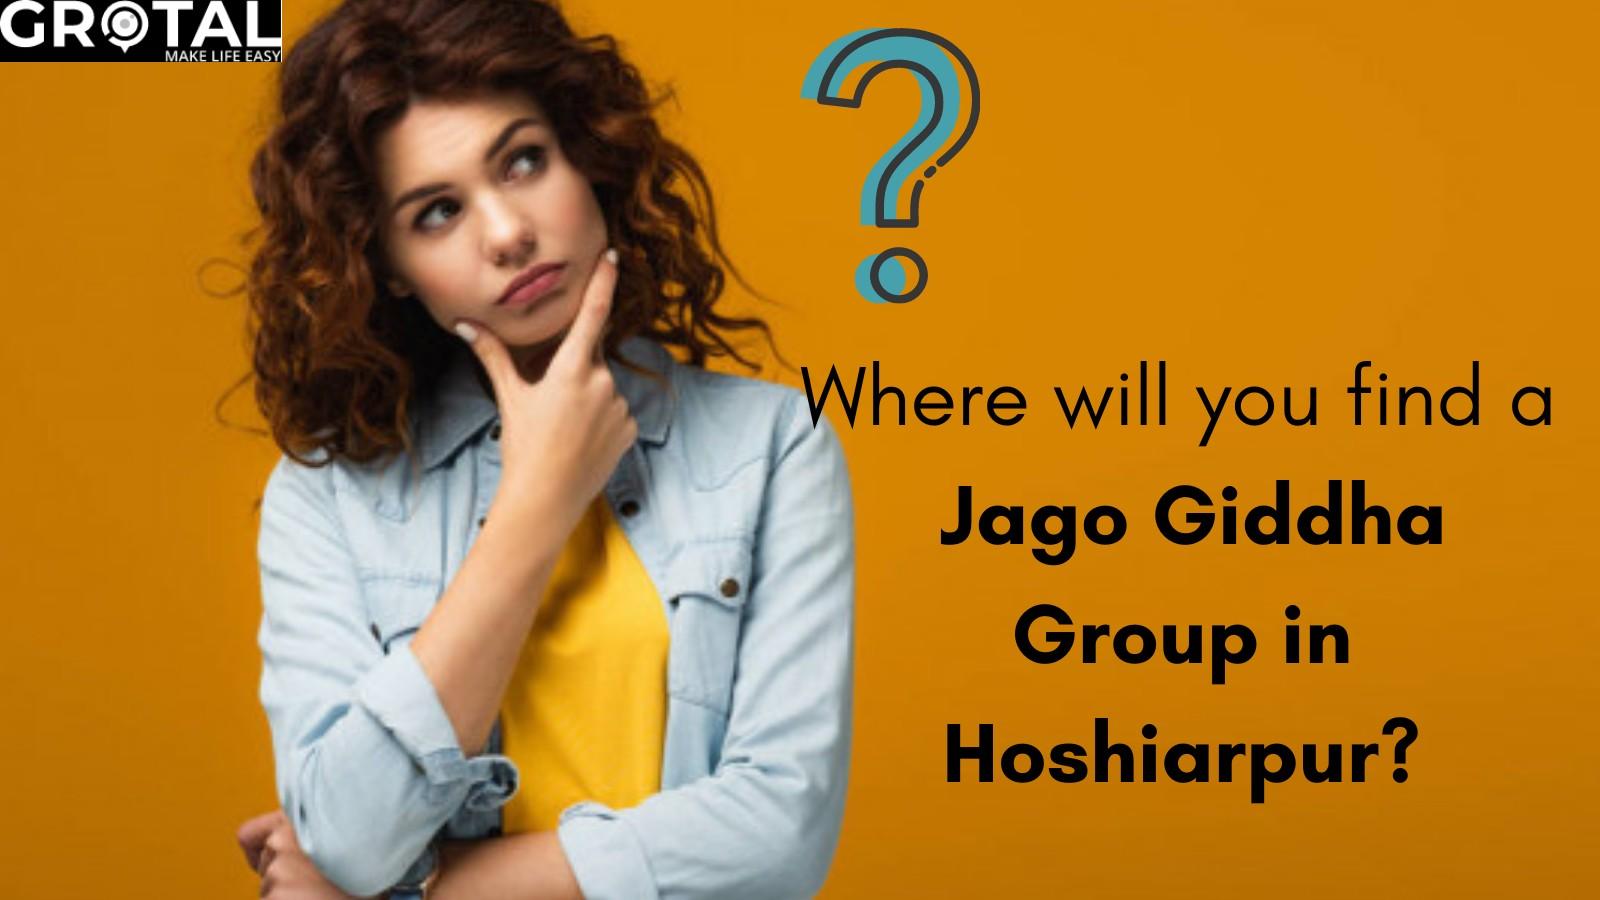 Jago Giddha Group in Hoshiarpur